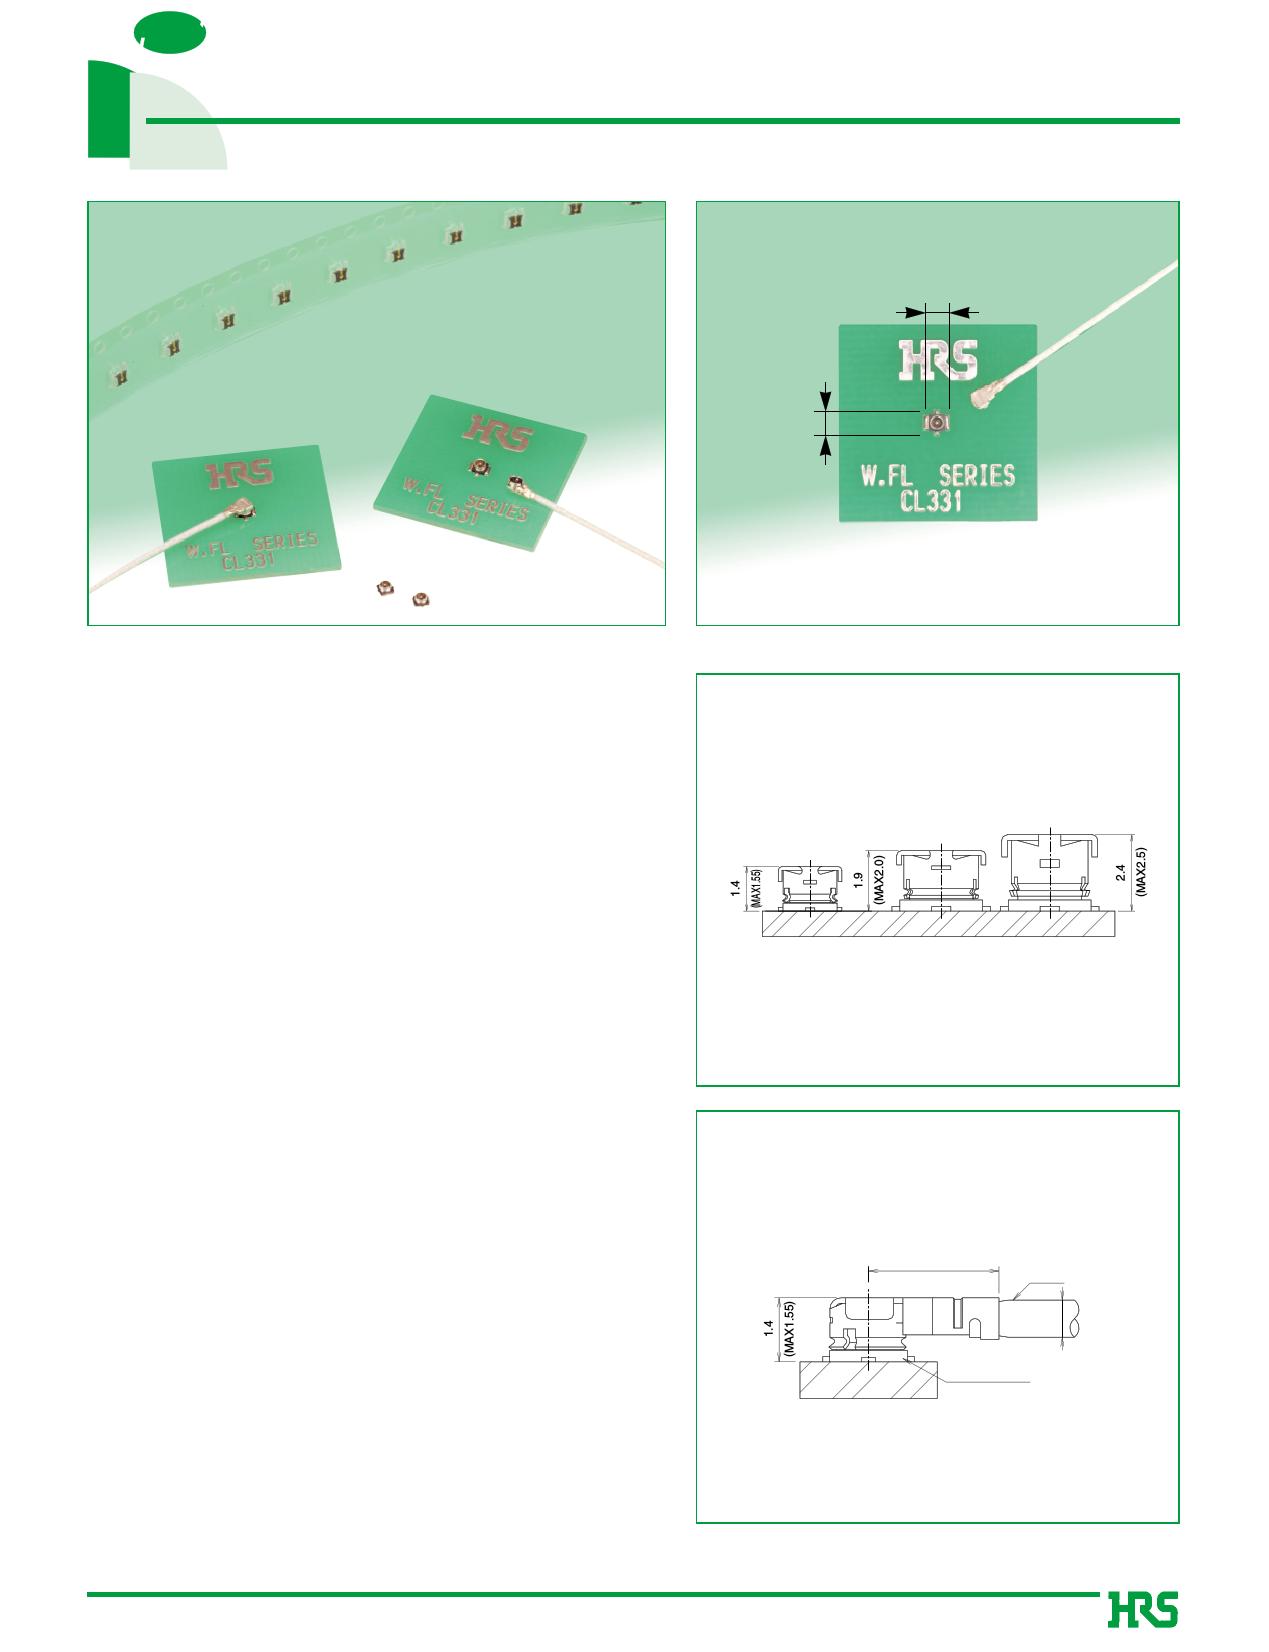 W.FL-LP-04N1-A datasheet